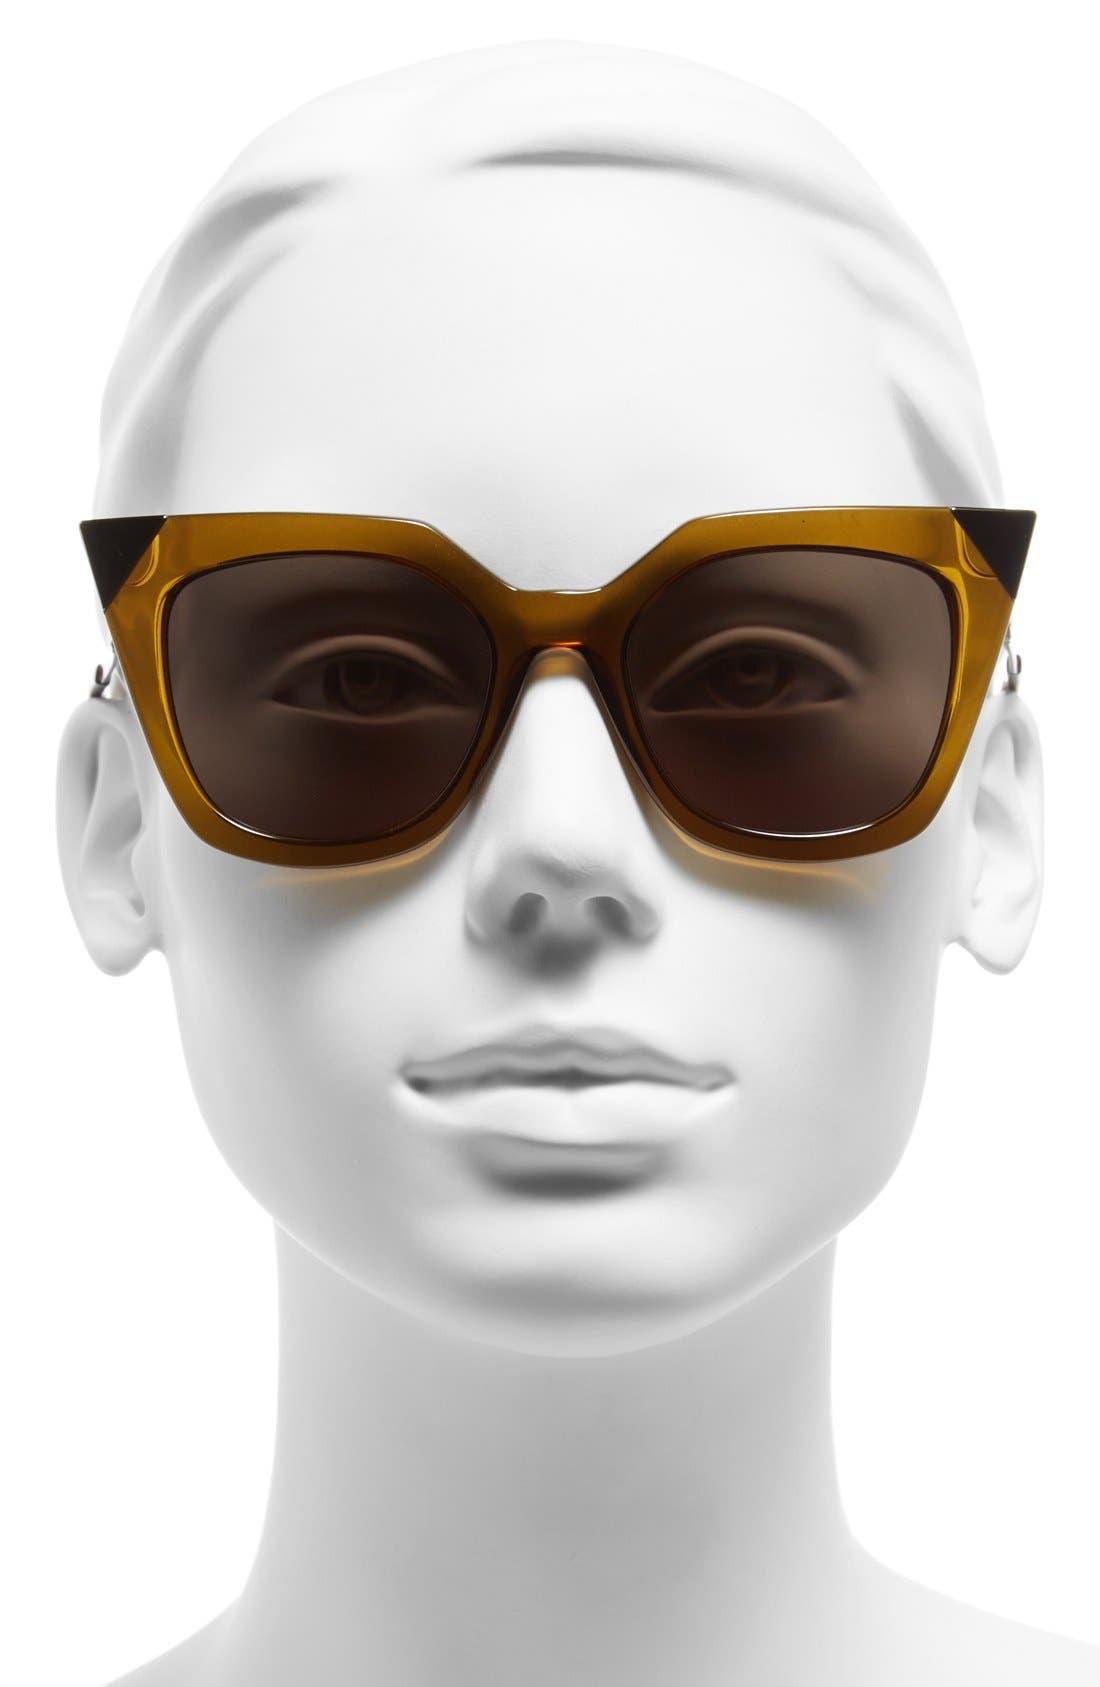 52mm Cat Eye Sunglasses,                             Alternate thumbnail 12, color,